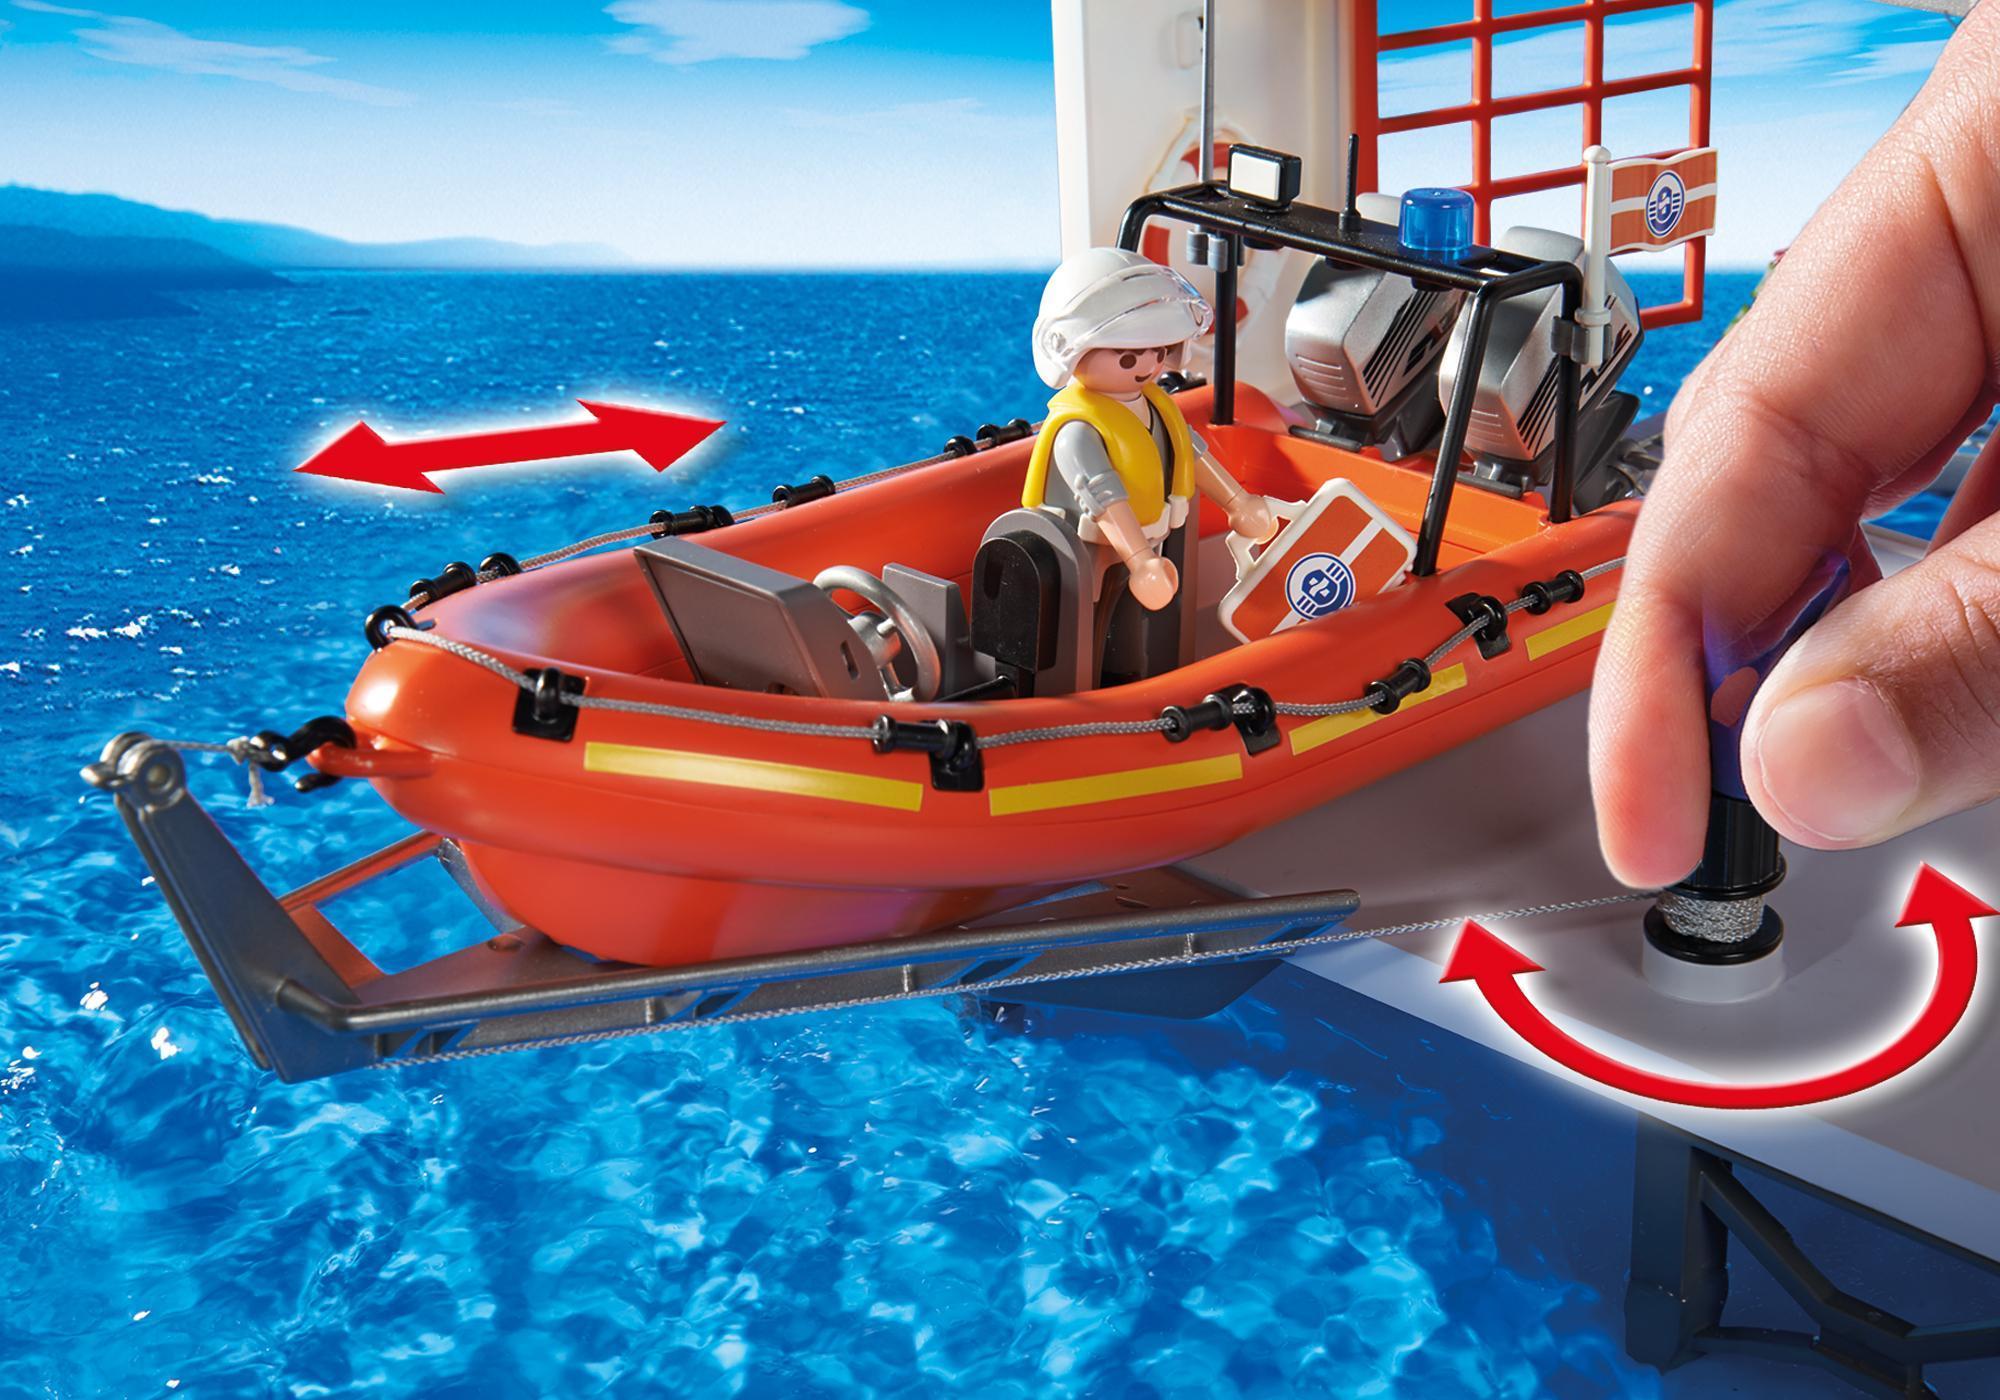 http://media.playmobil.com/i/playmobil/5539_product_extra2/Coast Guard Station with Lighthouse